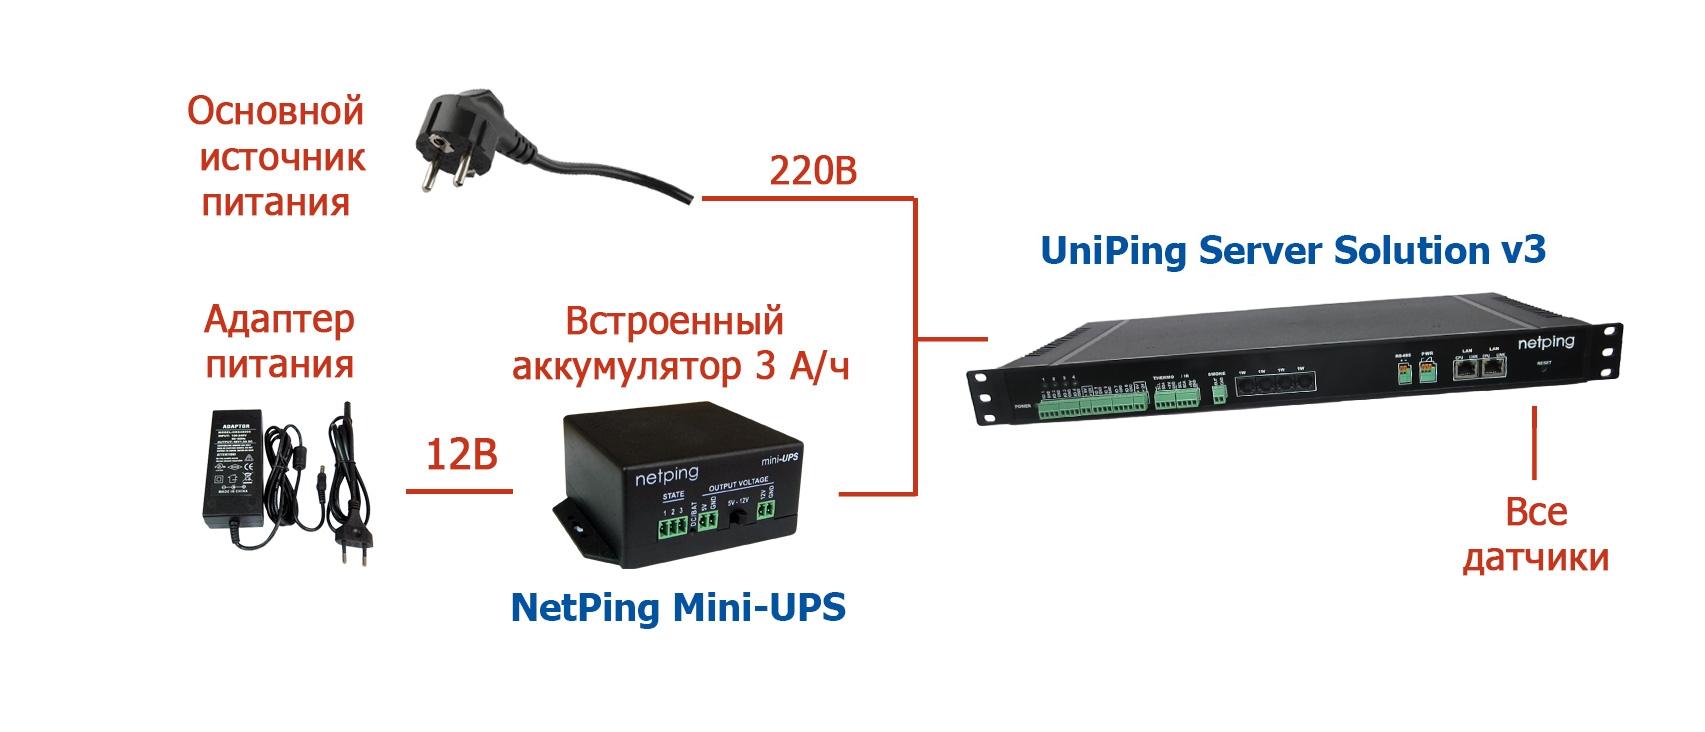 Бесперебойное питание UniPing server solution v3 от NetPing Mini-UPS